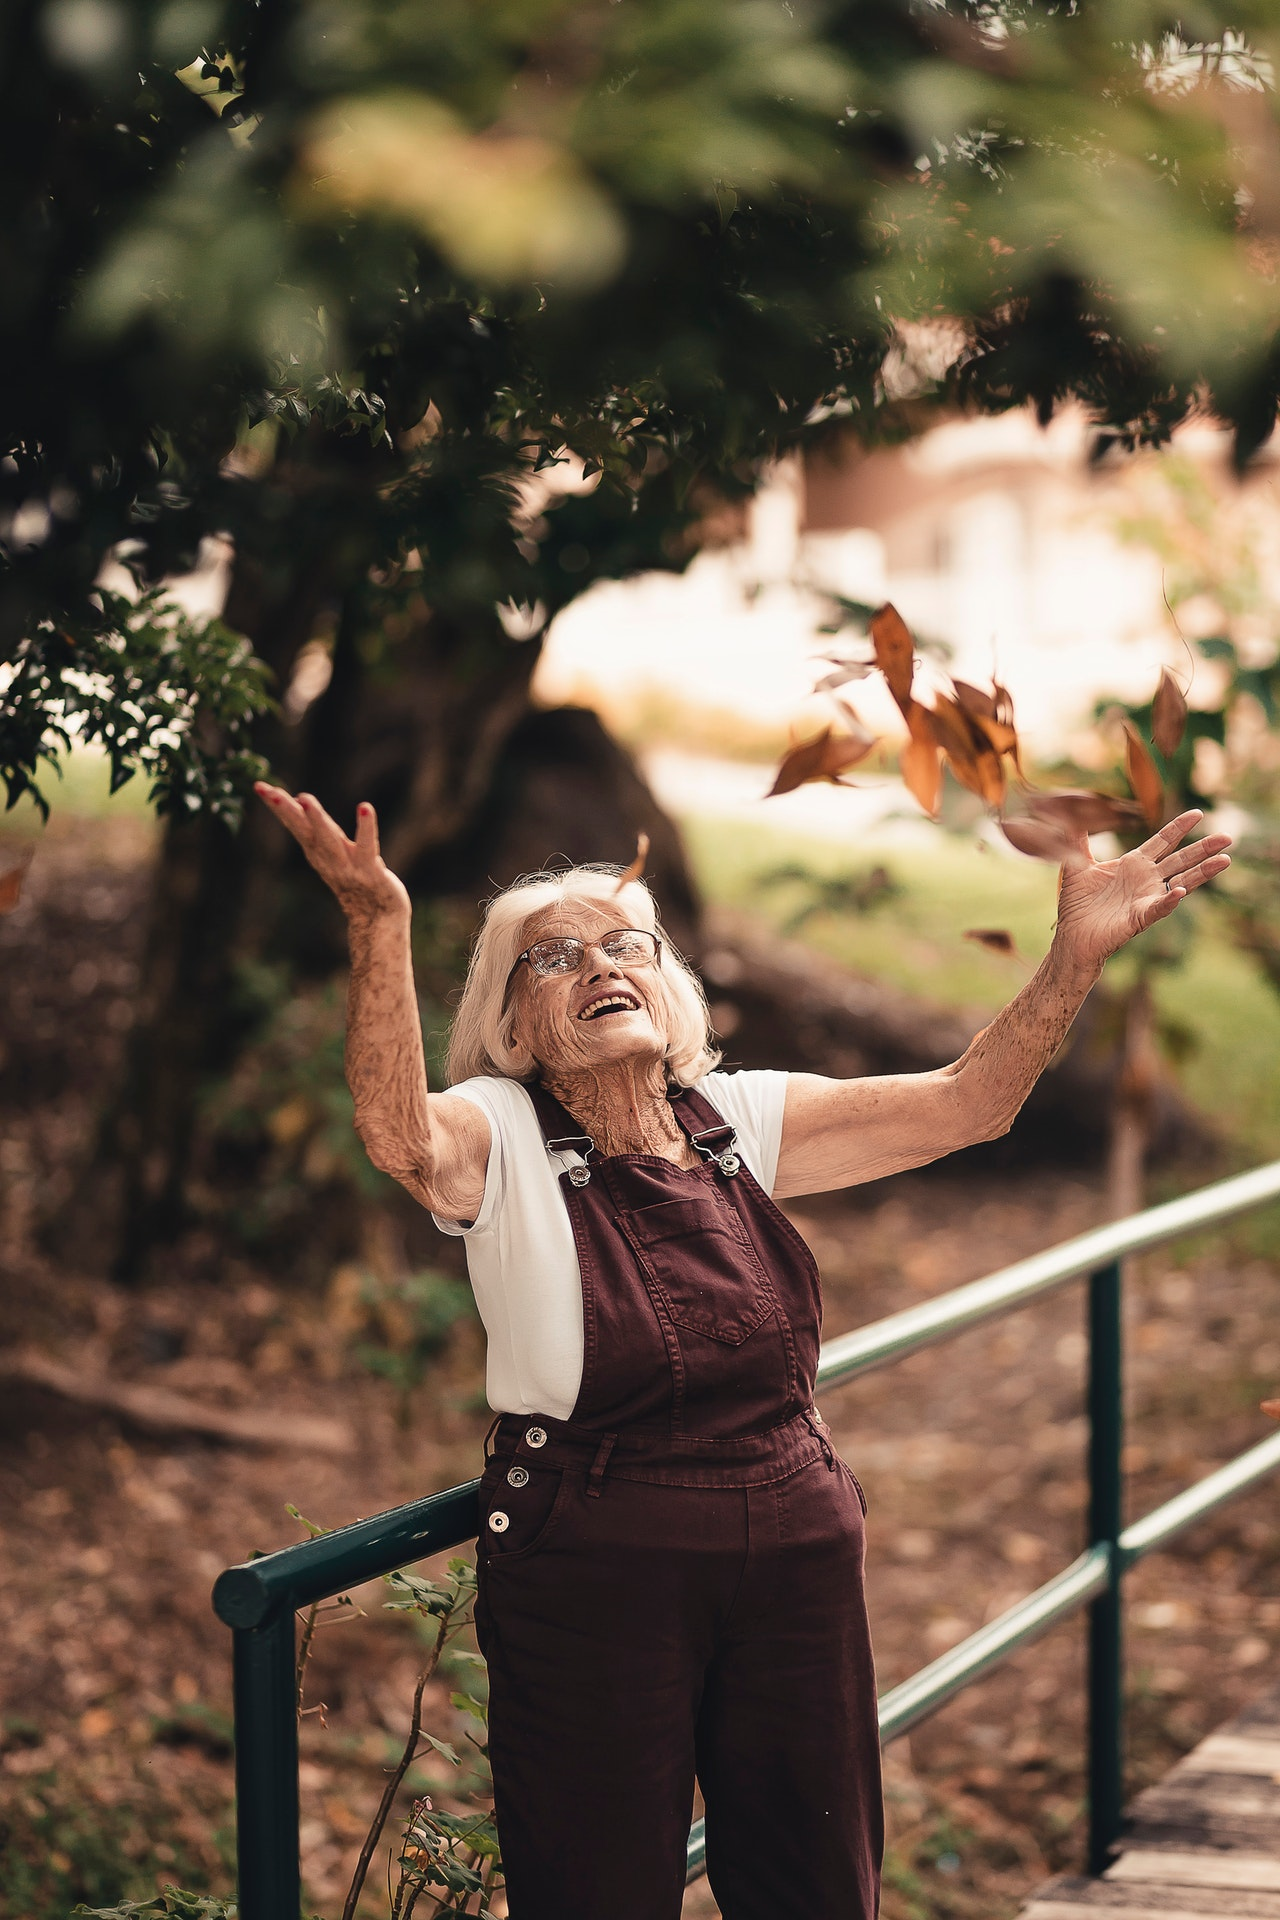 elderly-enjoyment-facial-expression-2050991